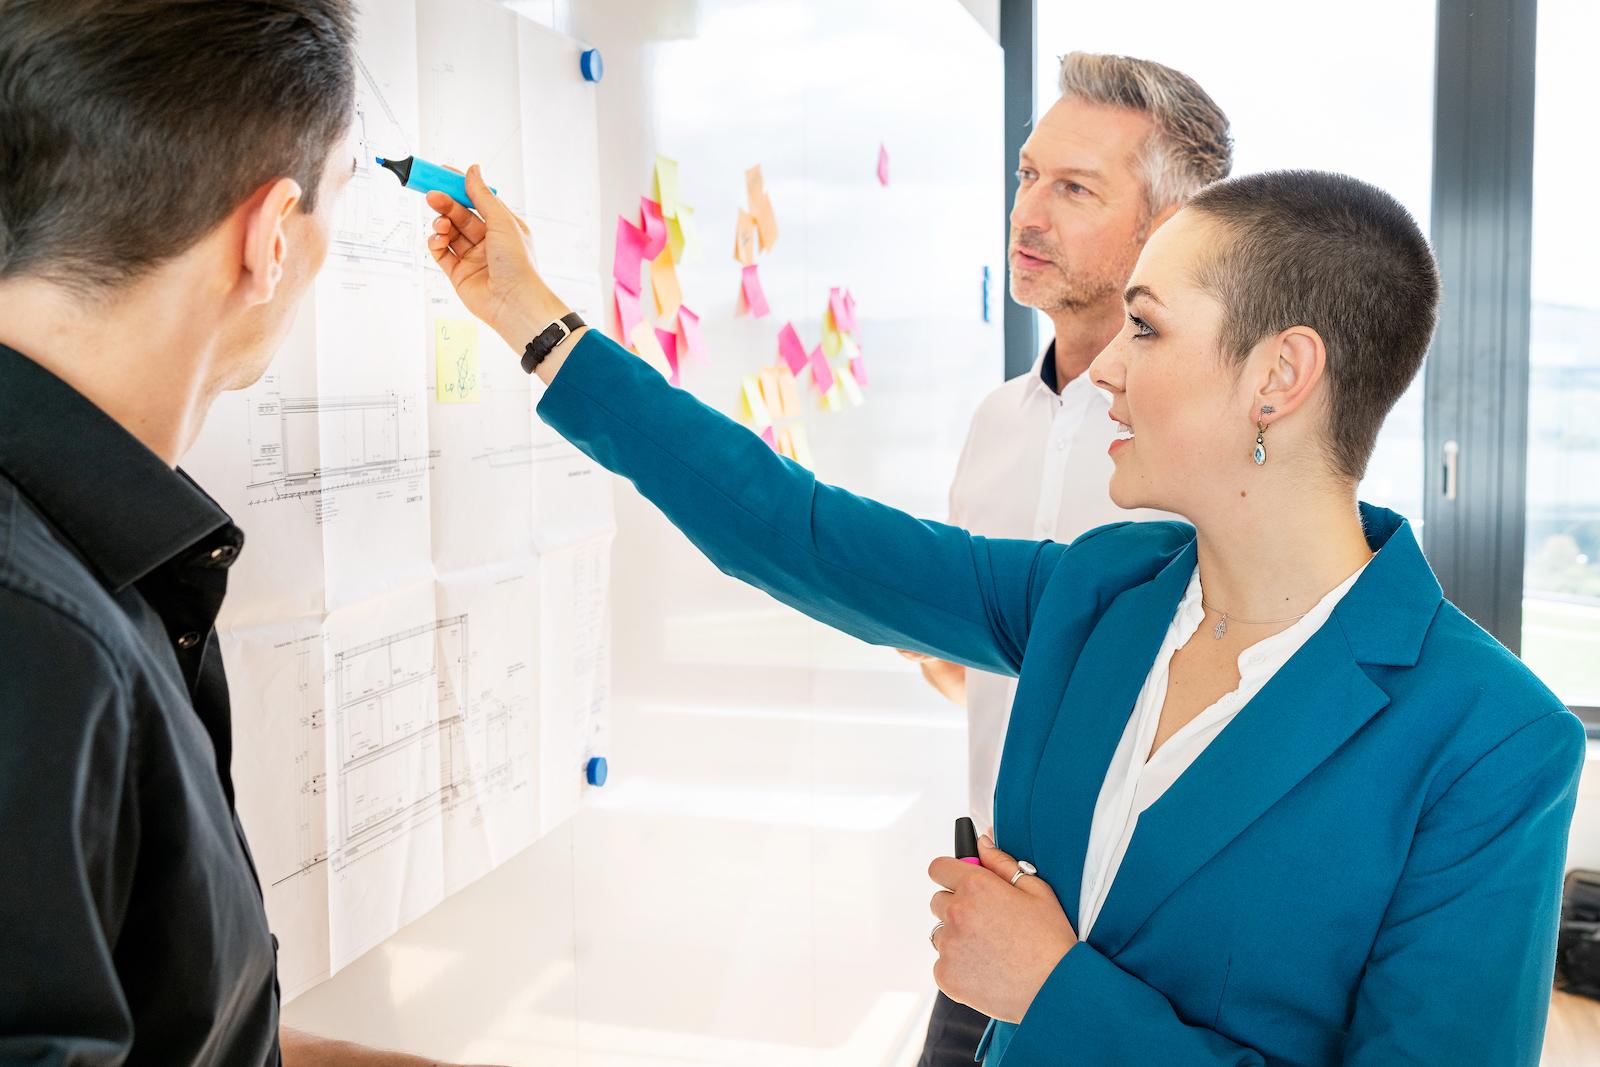 business styling dreier Gruppe am Whiteboard